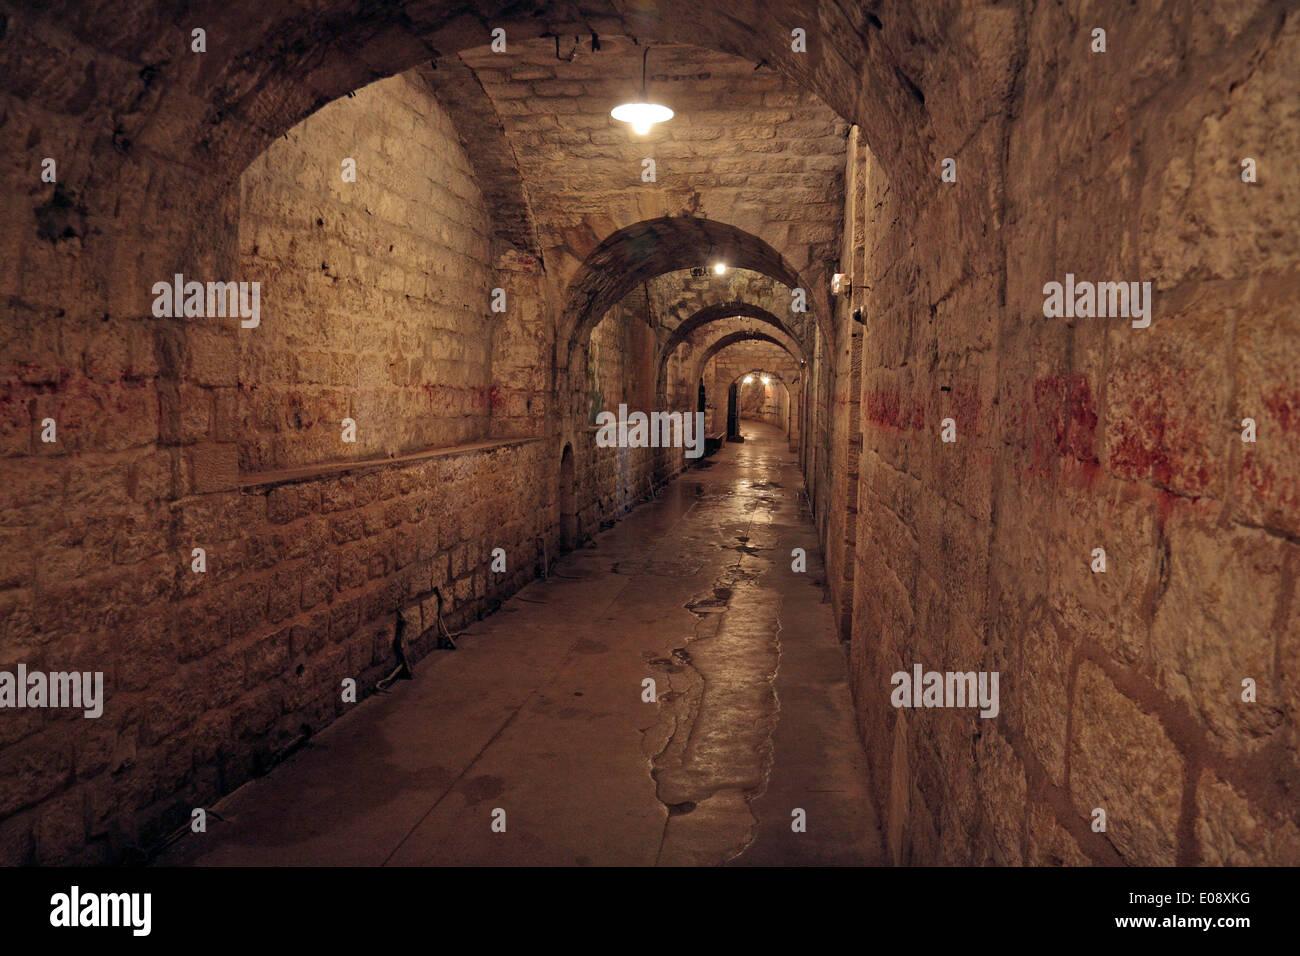 Long damp corridor inside Fort de Vaux, Verdun, Lorraine, France. - Stock Image